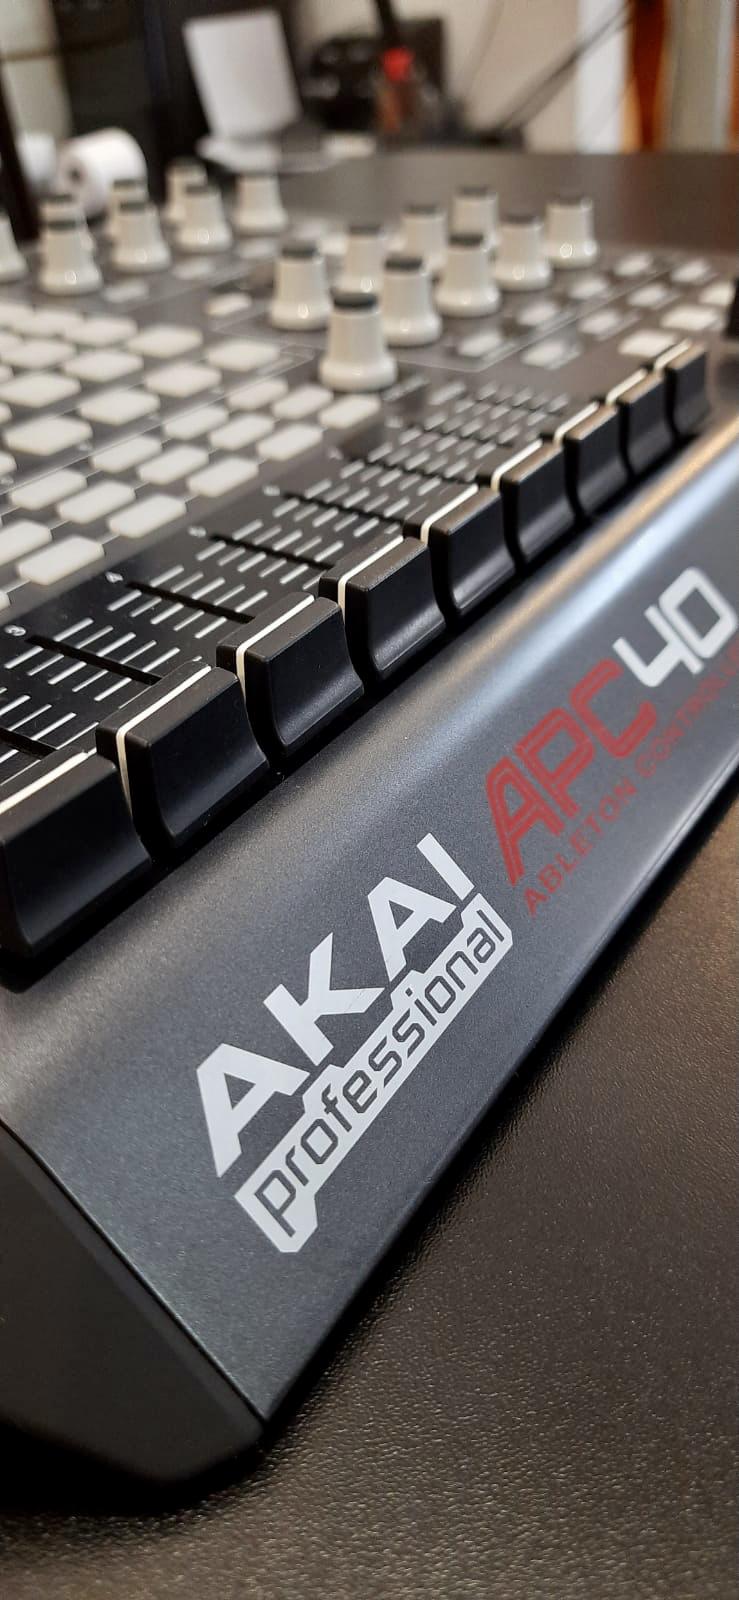 Controlador AKAI APC 40-MIDI / USB p/ Ableton Live (Semi-Novo)